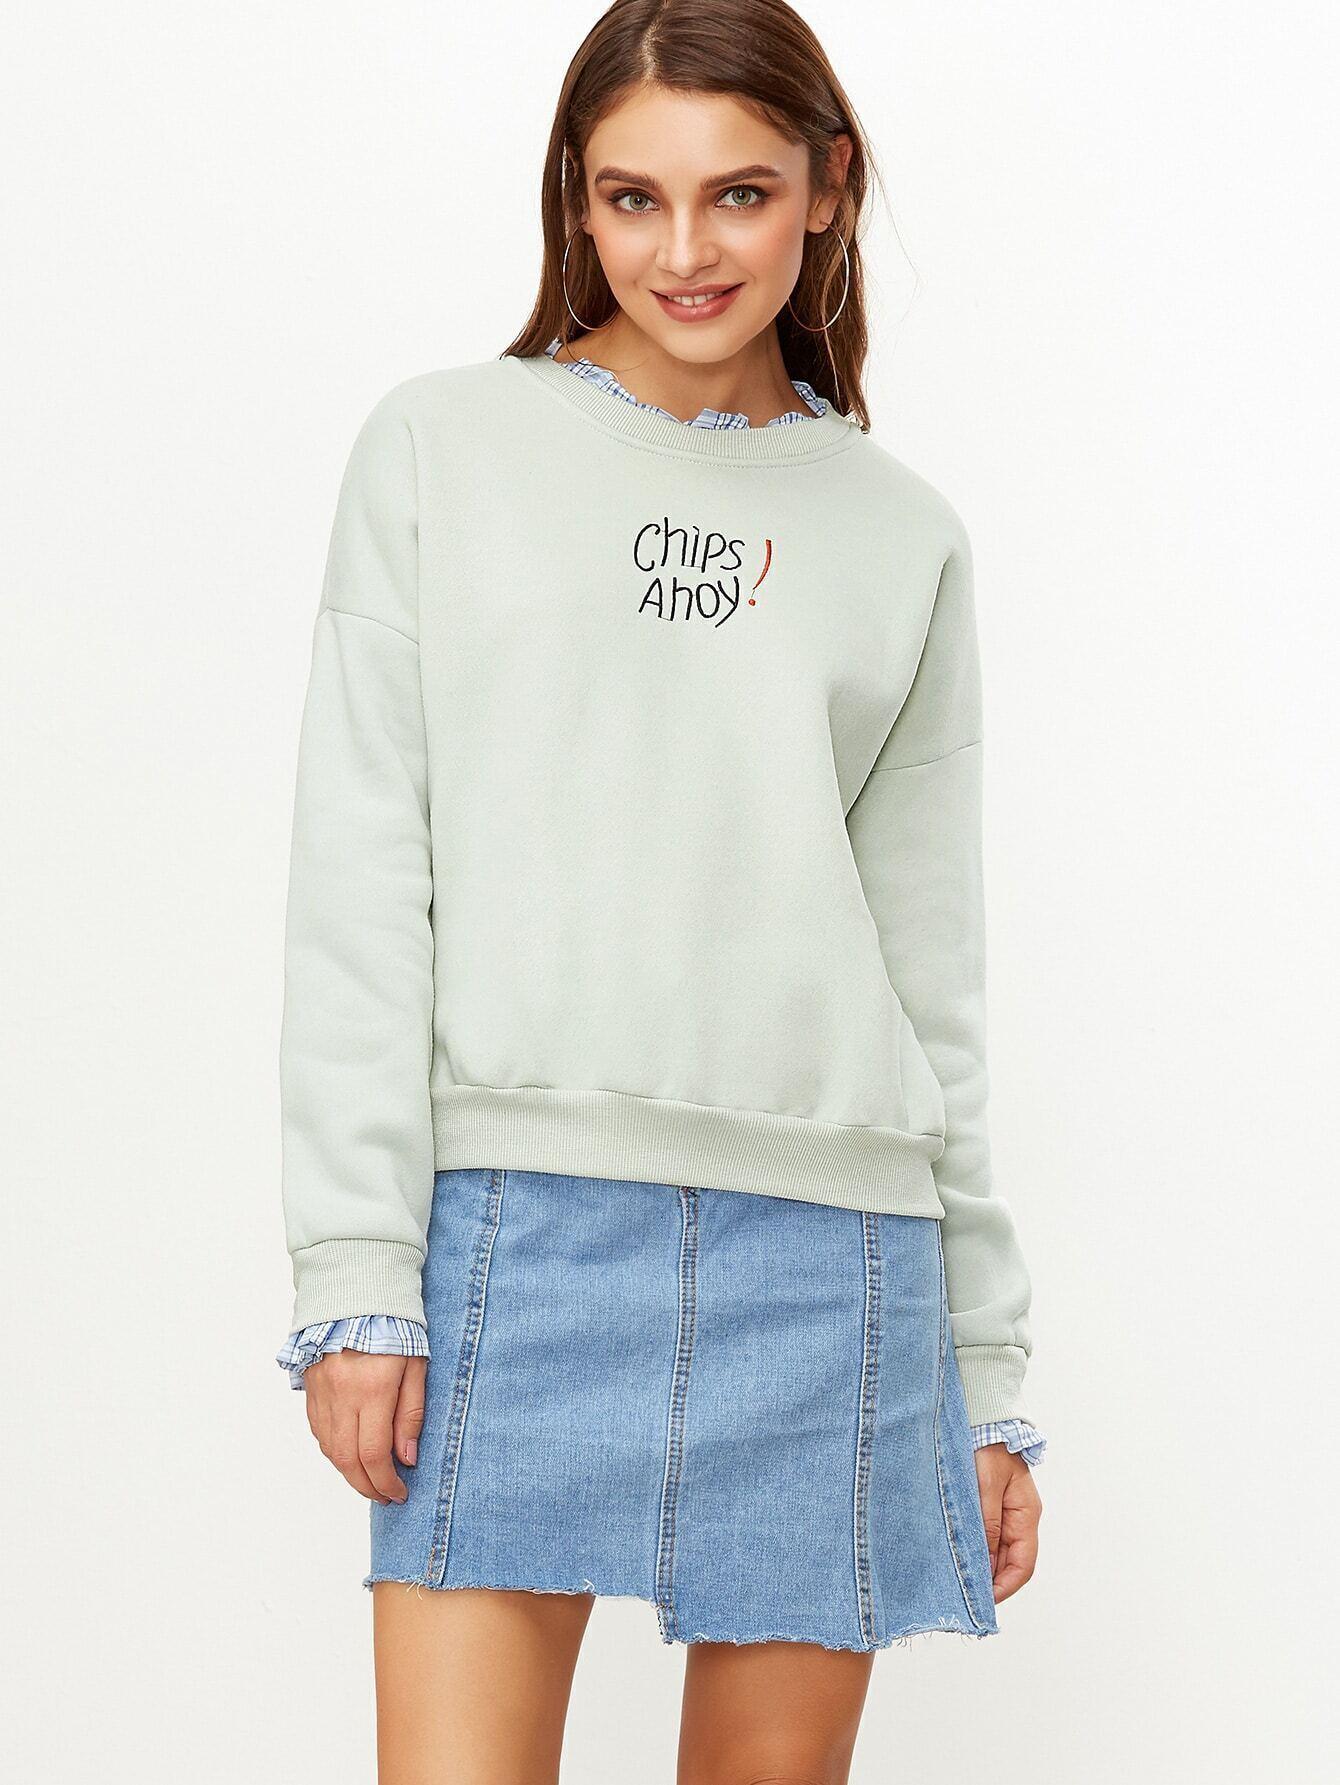 Pale Green Contrast Ruffle Trim Letter Embroidery Sweatshirt